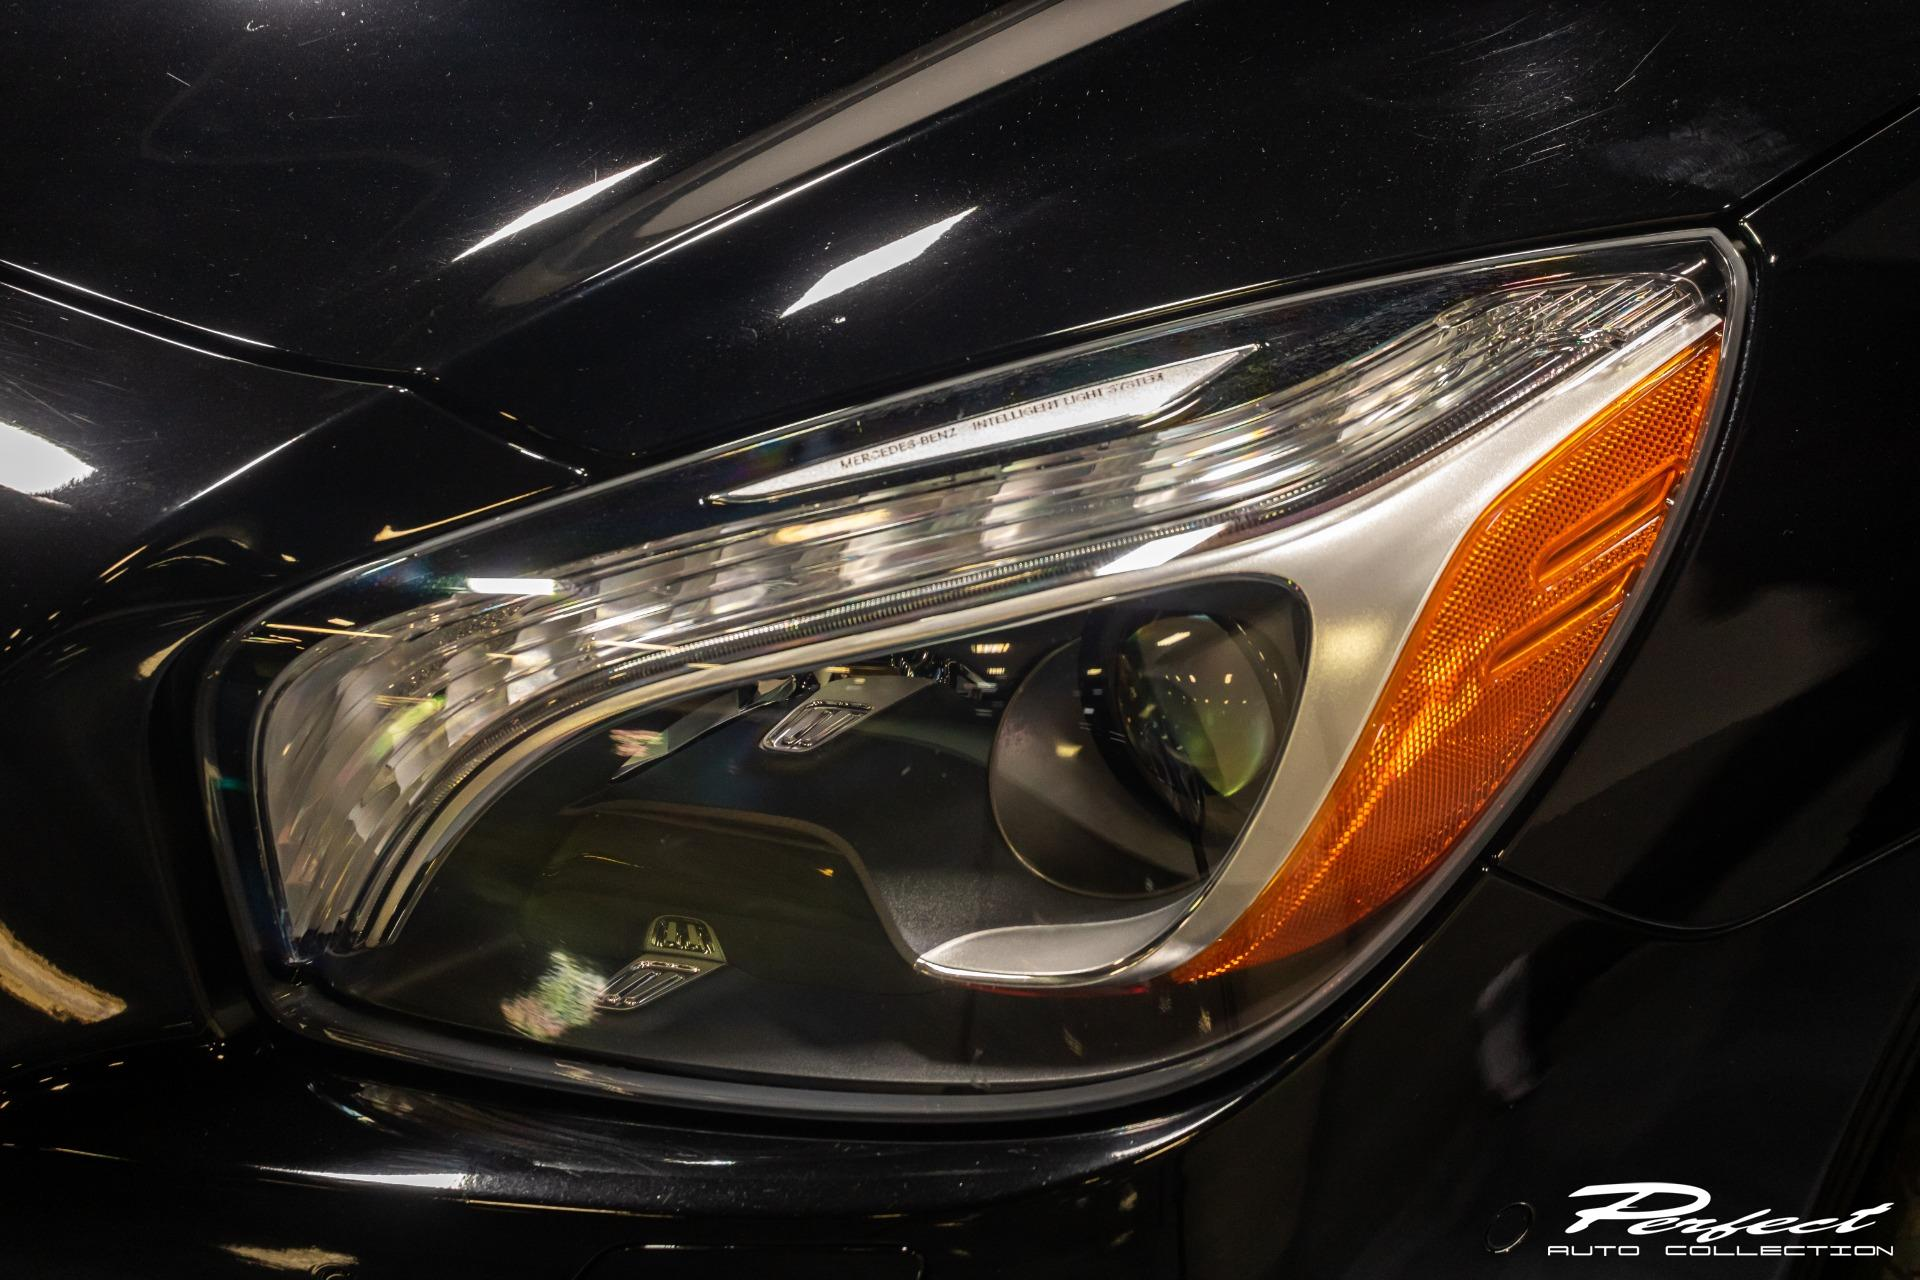 Used 2014 Mercedes Benz SL Class SL 550